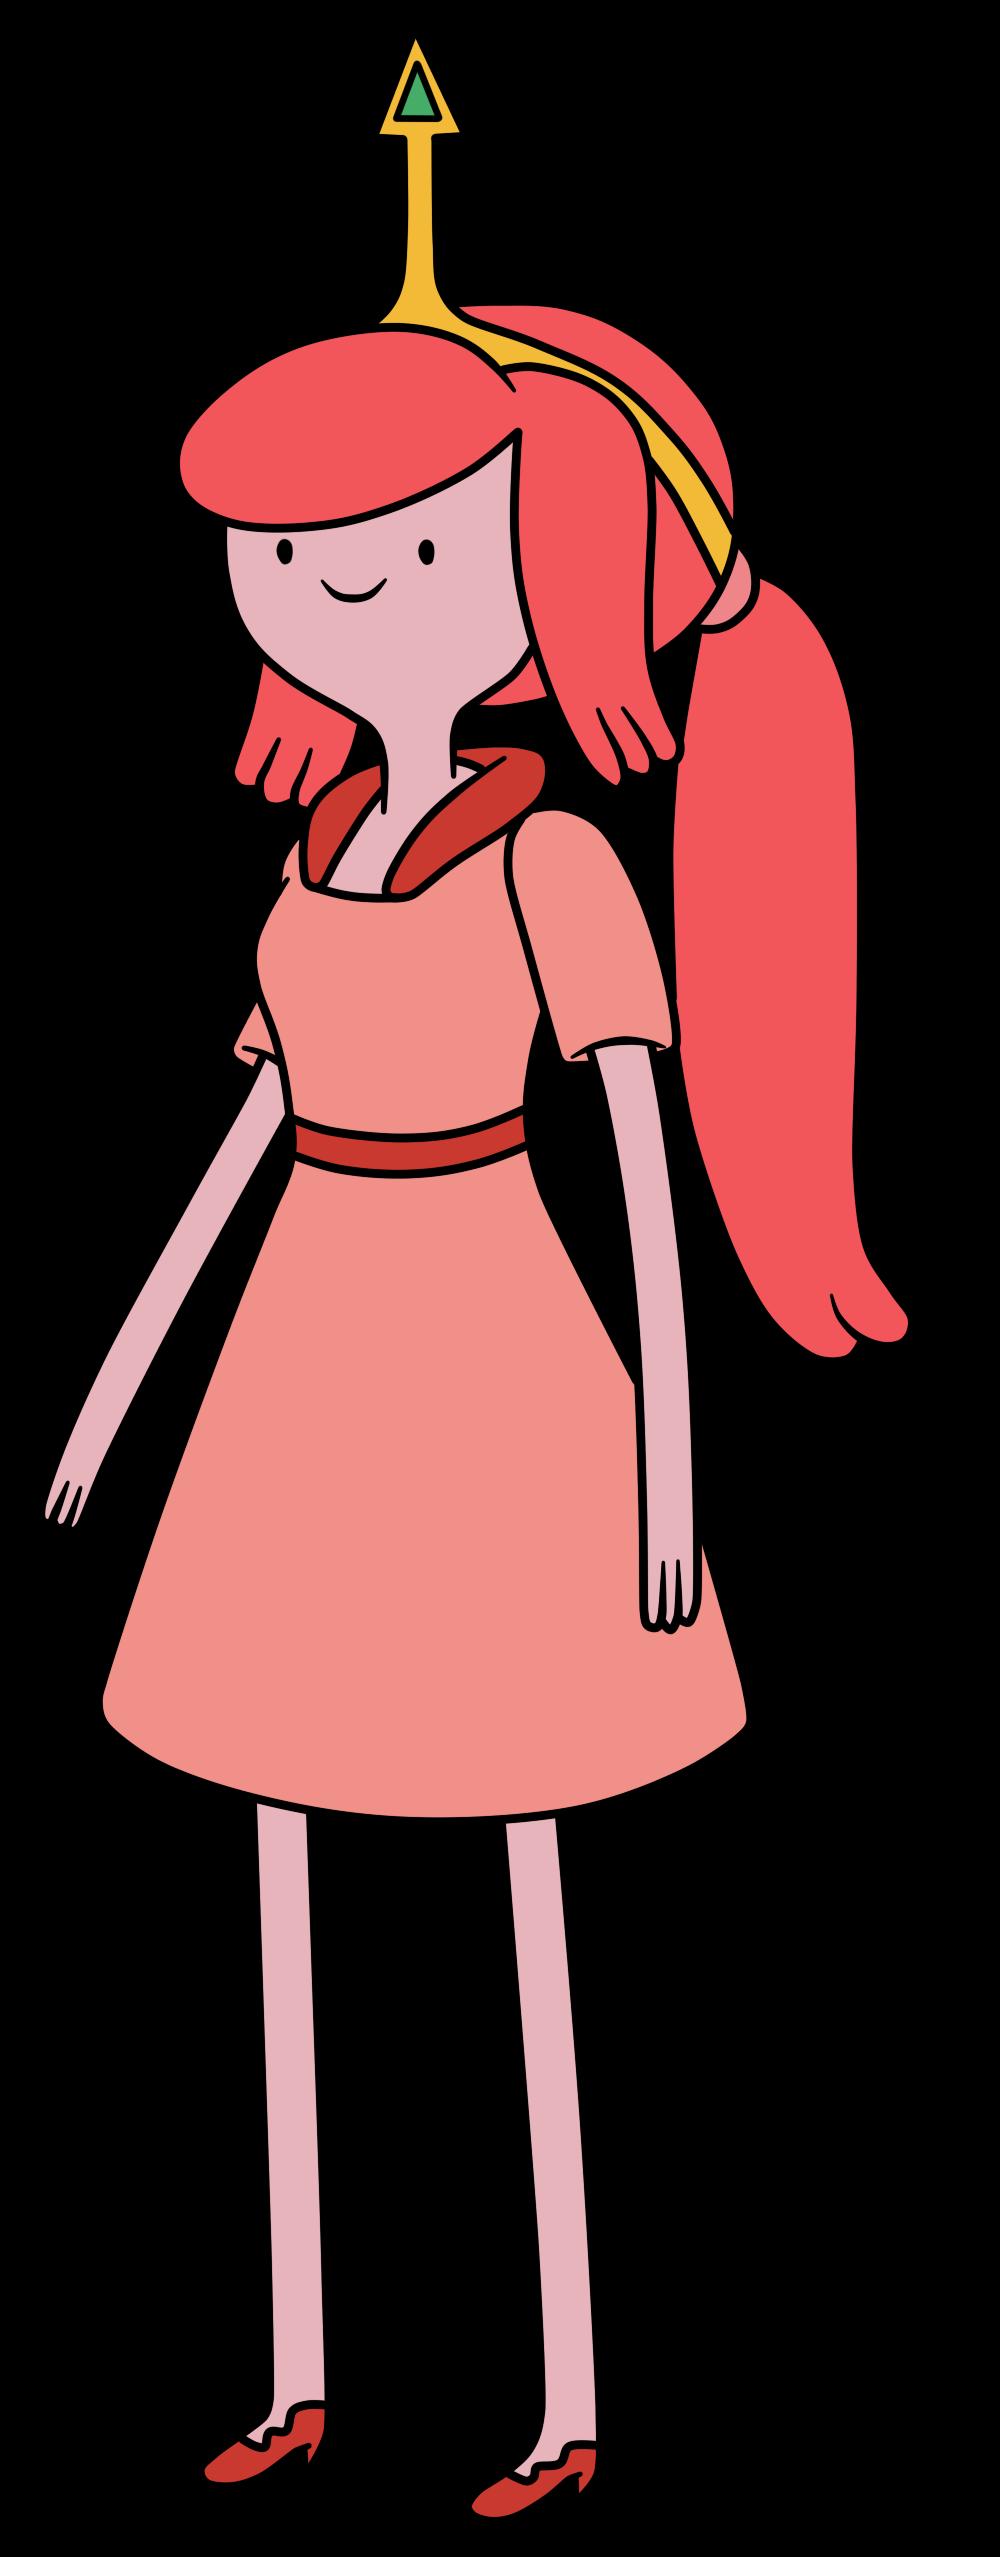 Princess Chewypaste